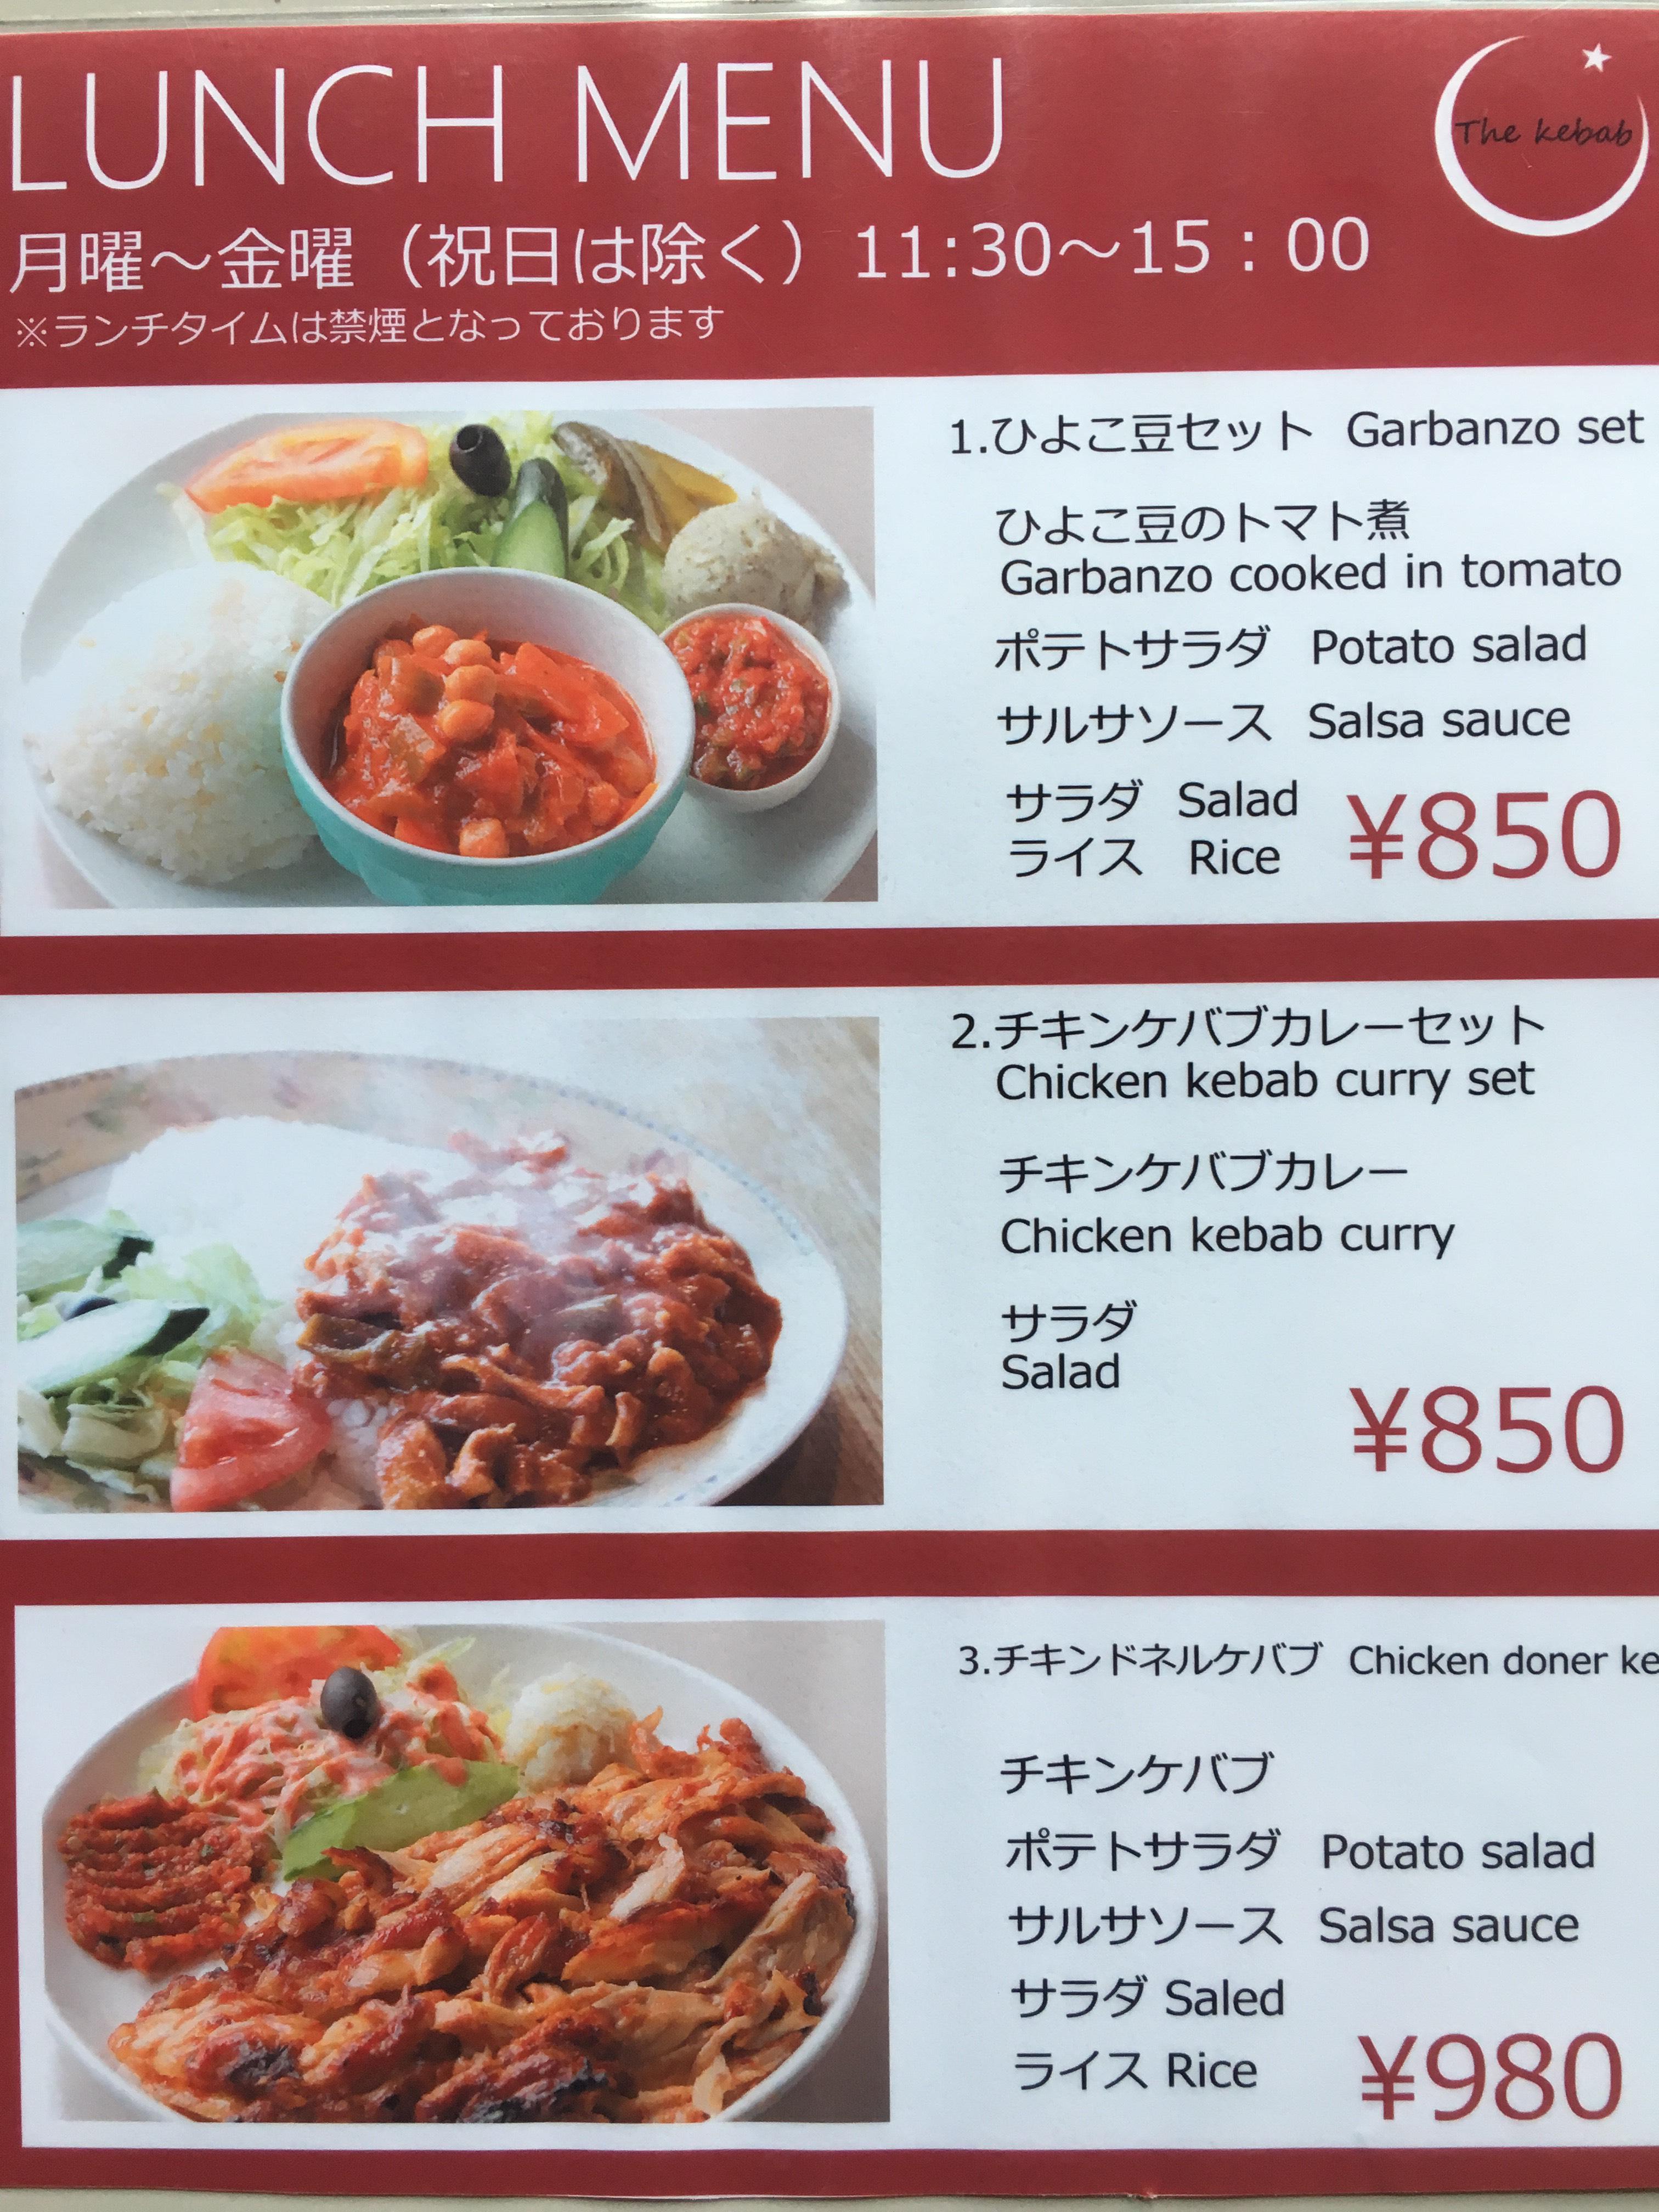 the kebab lunch menu